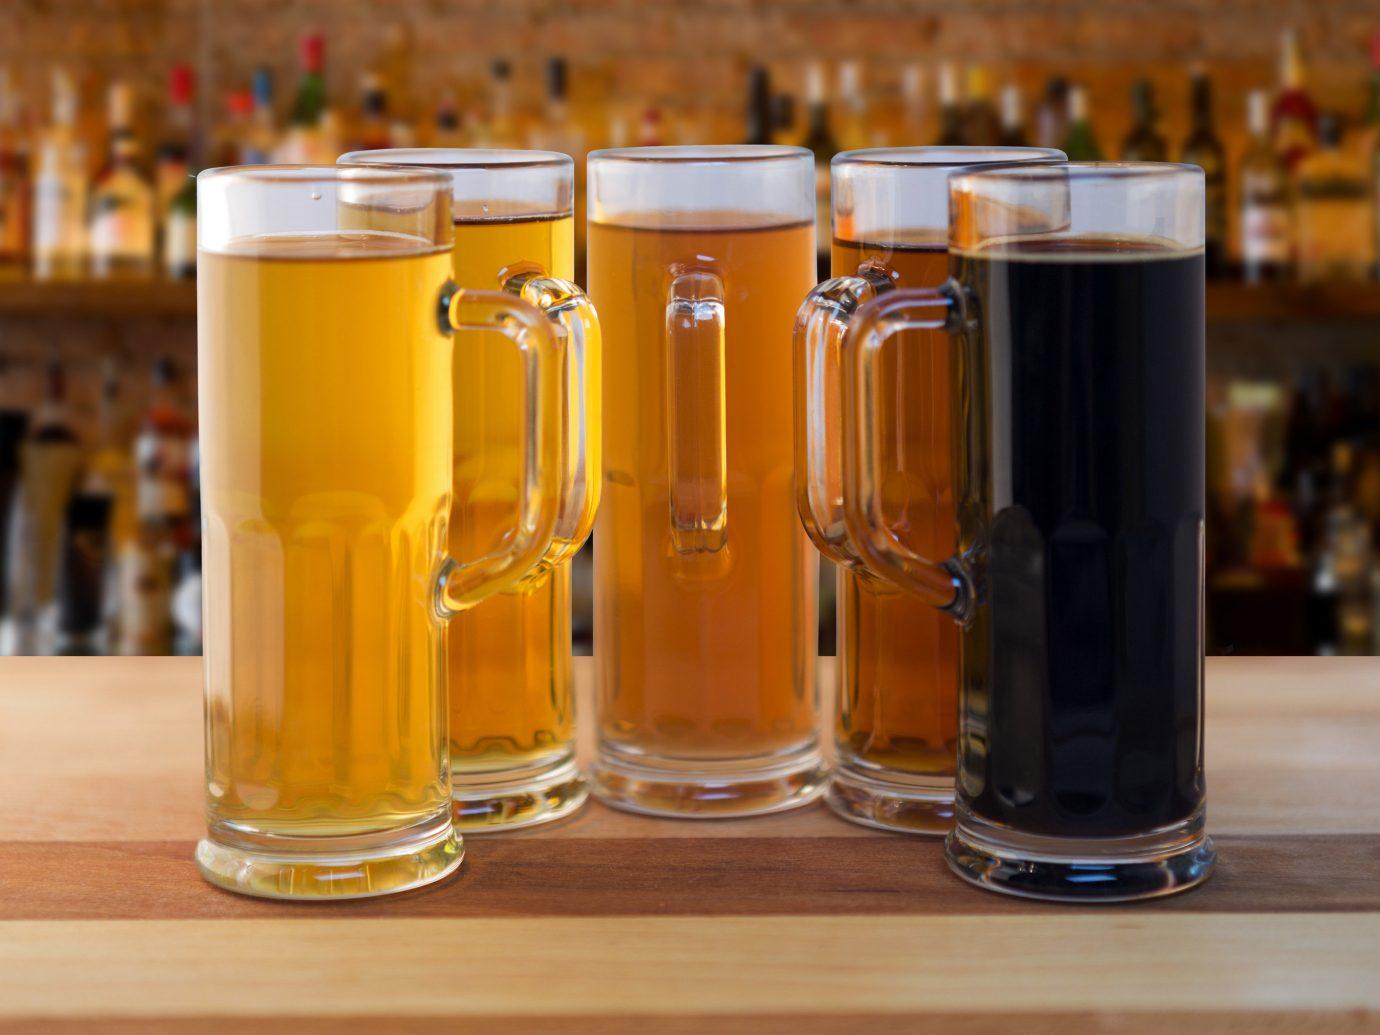 Trip Ideas cup table alcoholic beverage Drink distilled beverage beer liqueur bottle pint us drinkware glass beverage